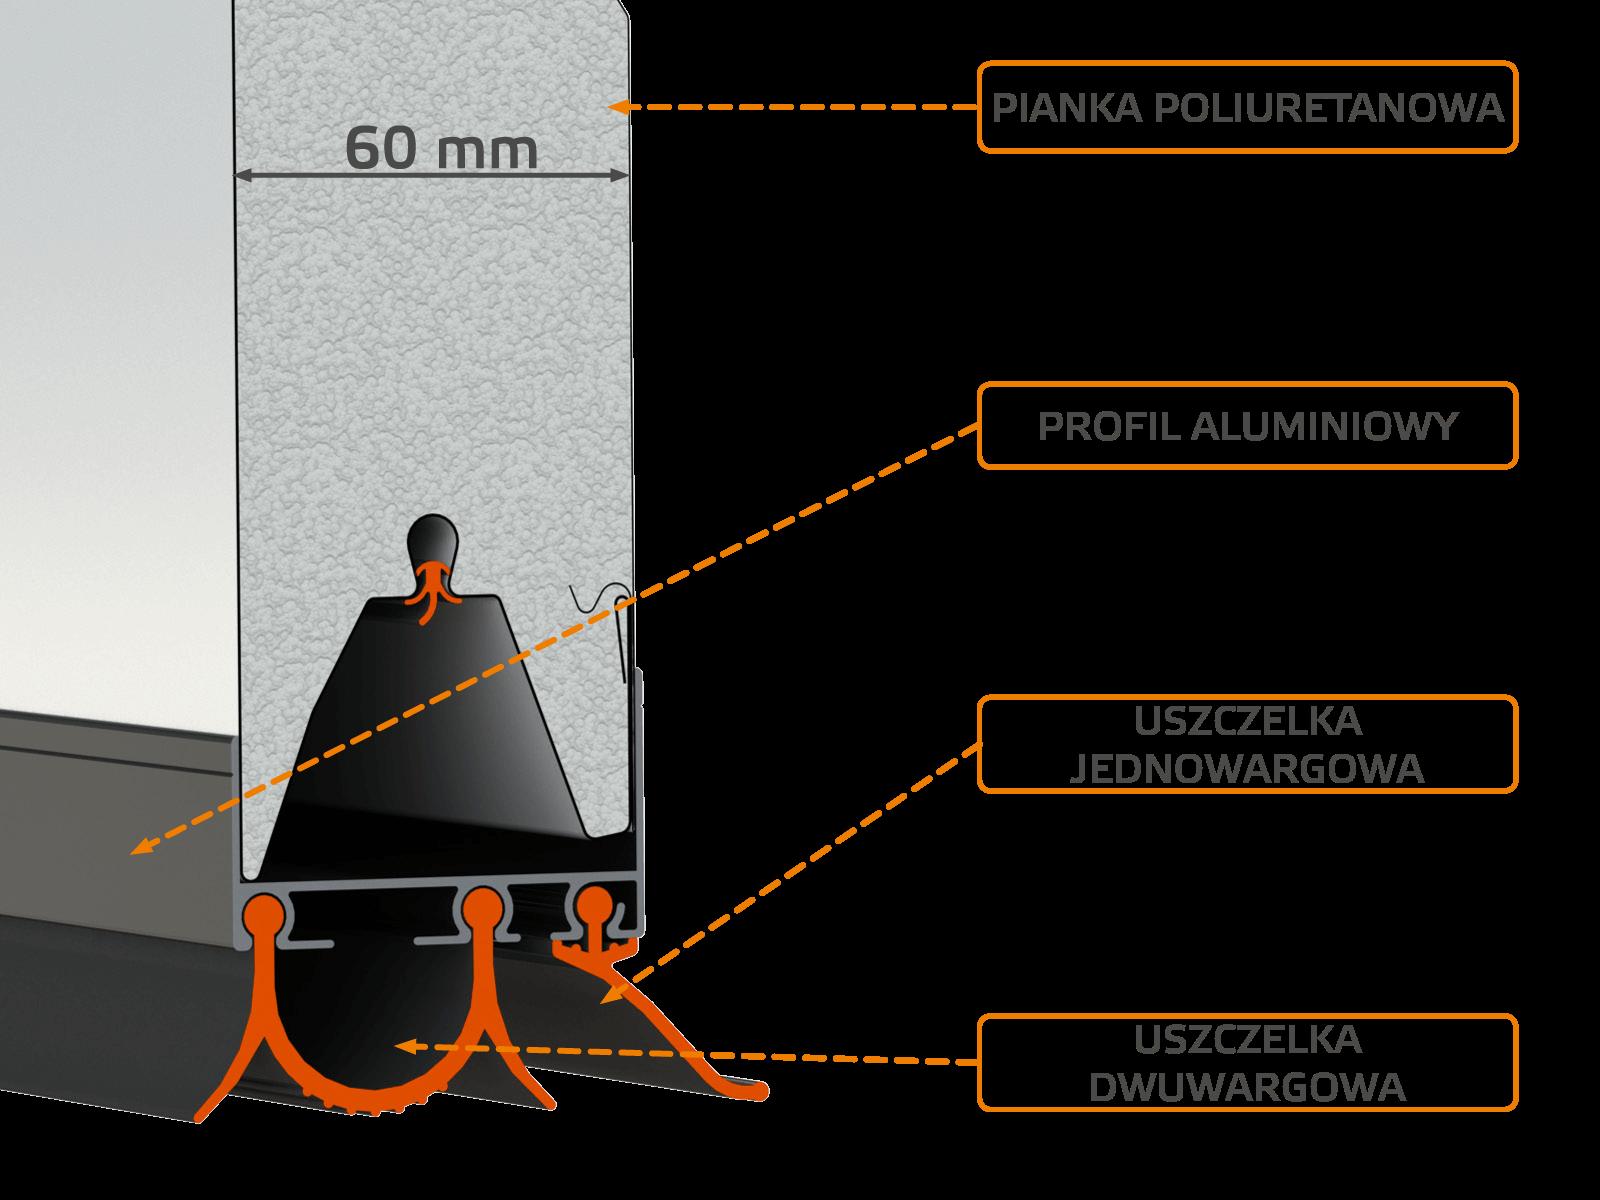 zdjecia_infografika_2